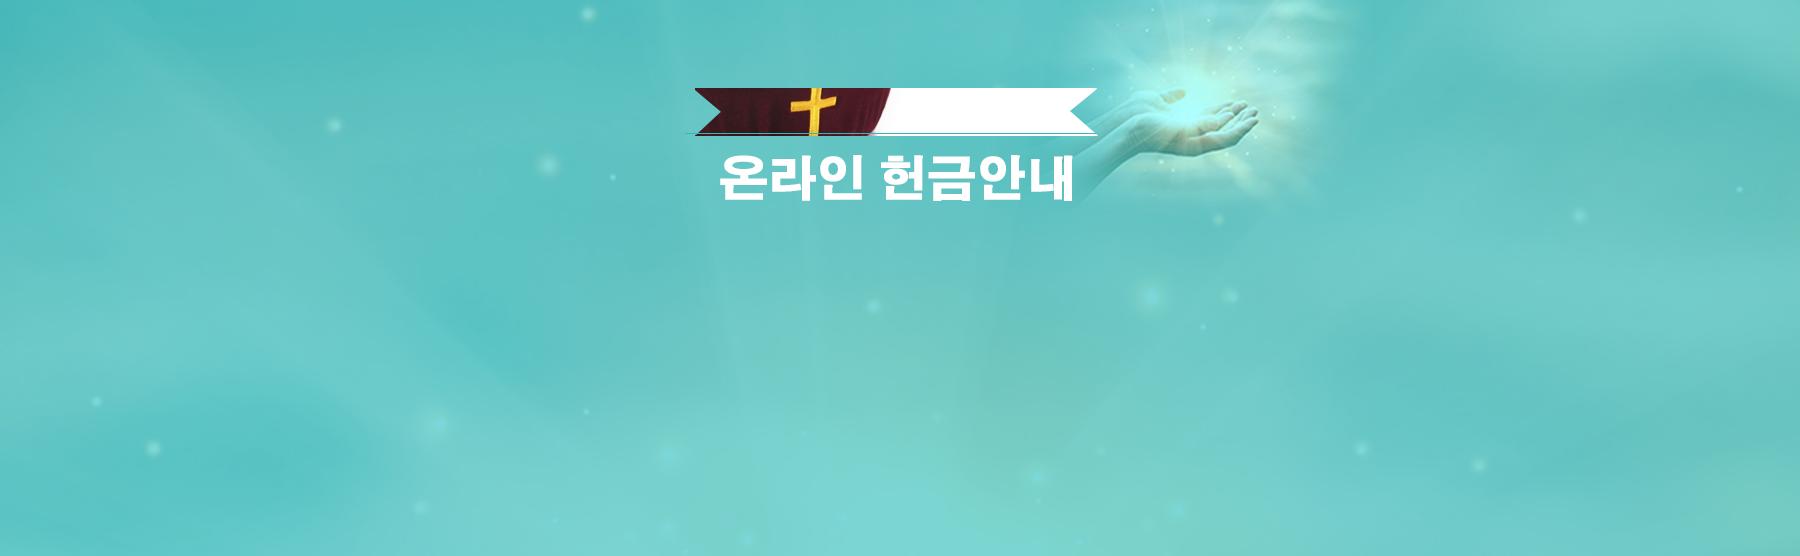 psh-banner-co-온라인헌금안내-2.jpg